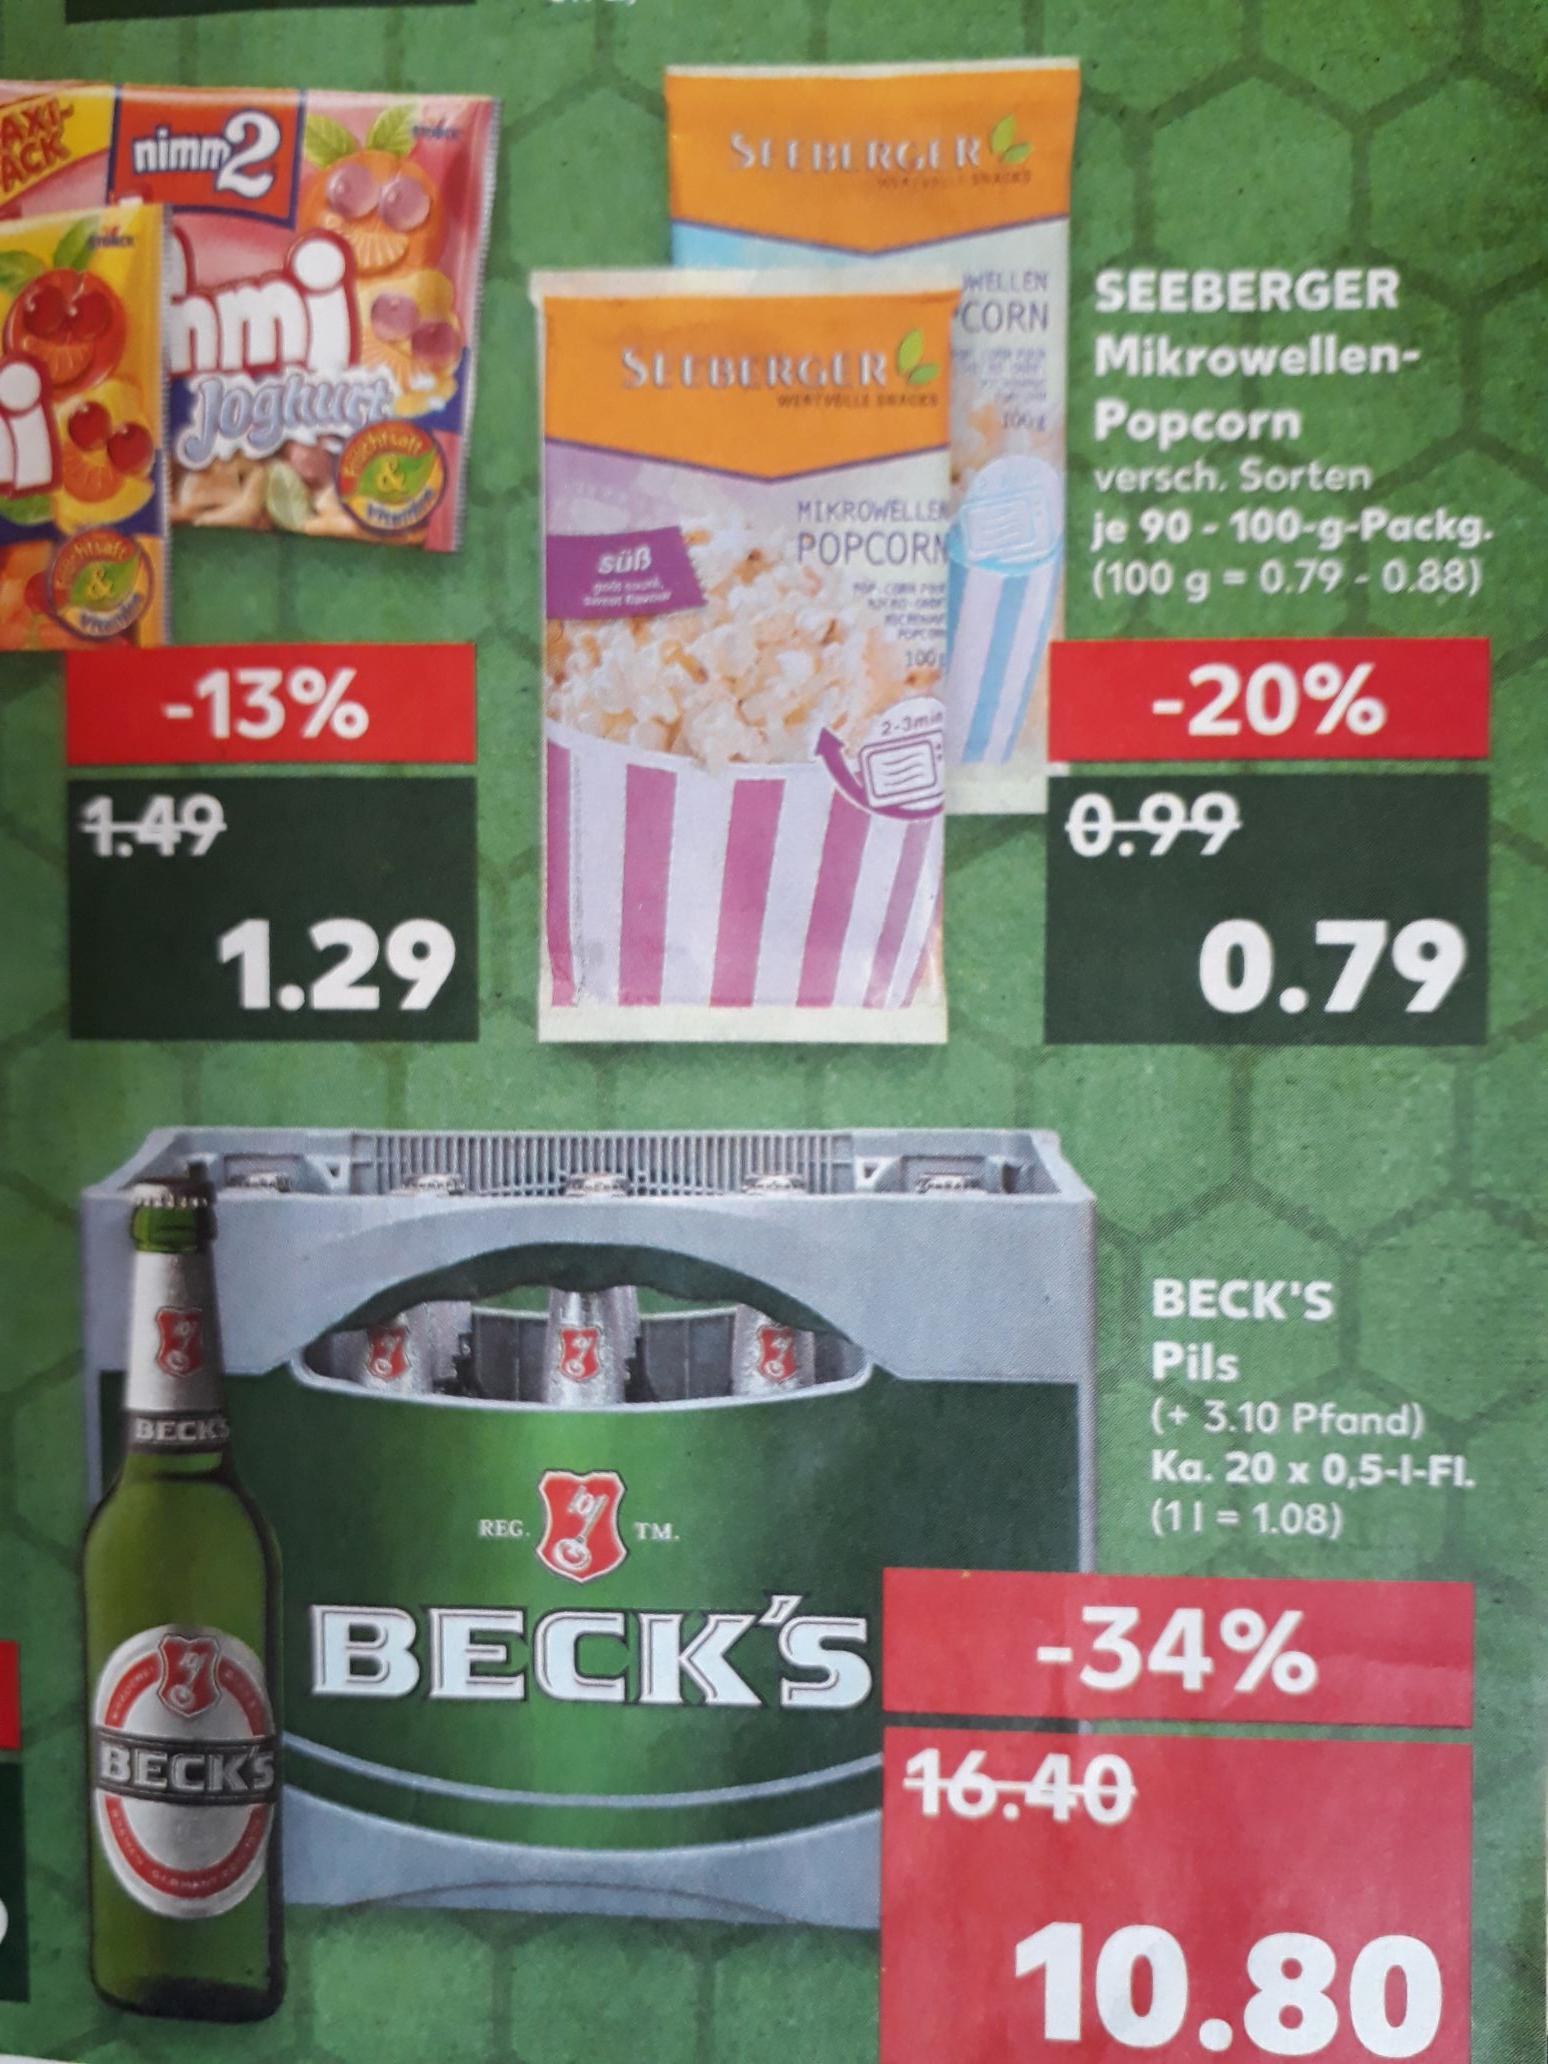 [Kaufland Köln] Beck's Pils 20x 0,5L (Seeberger Mikrowellen Popcorn 0,79; Valensina 0,99; Bübchen 1,49)